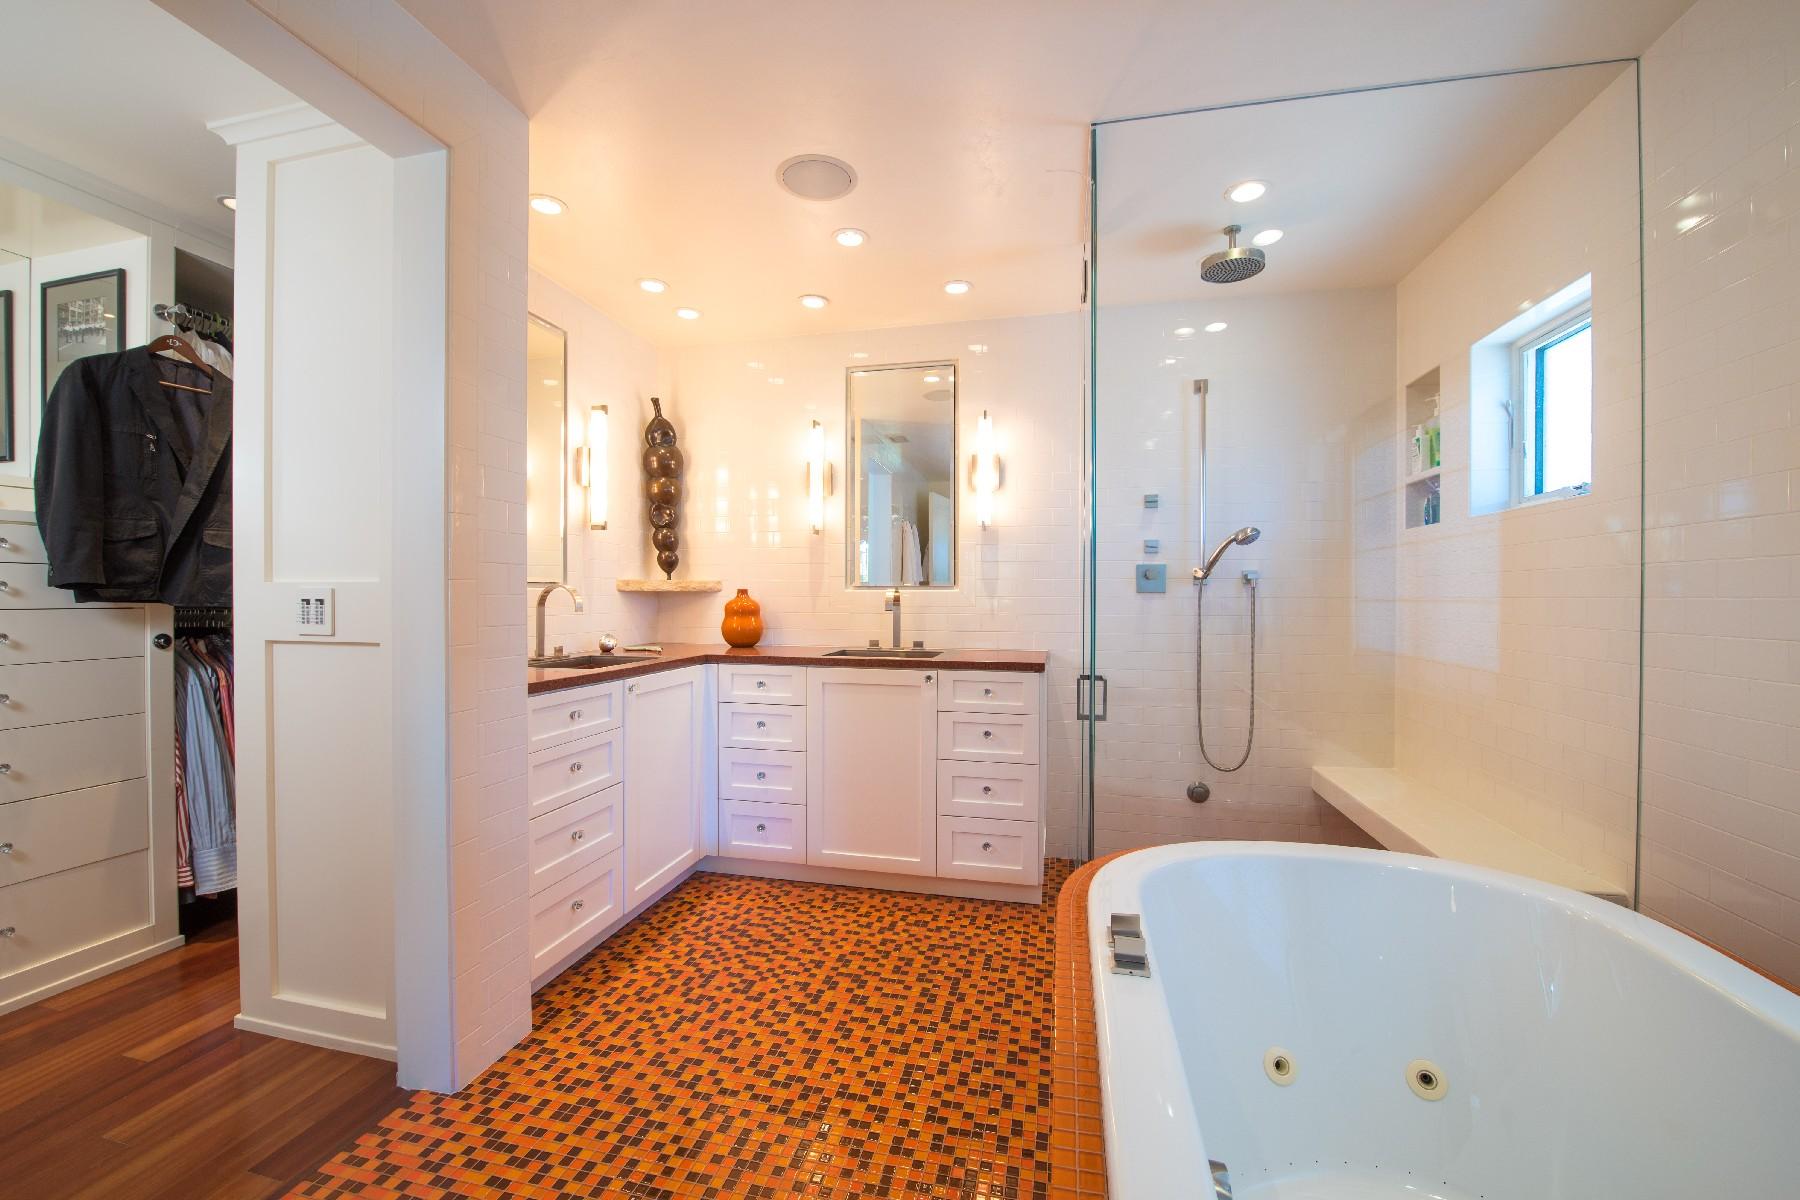 Additional photo for property listing at 734 Glorietta Boulevard 734 Glorietta Bouldevard Coronado, California 92118 Estados Unidos